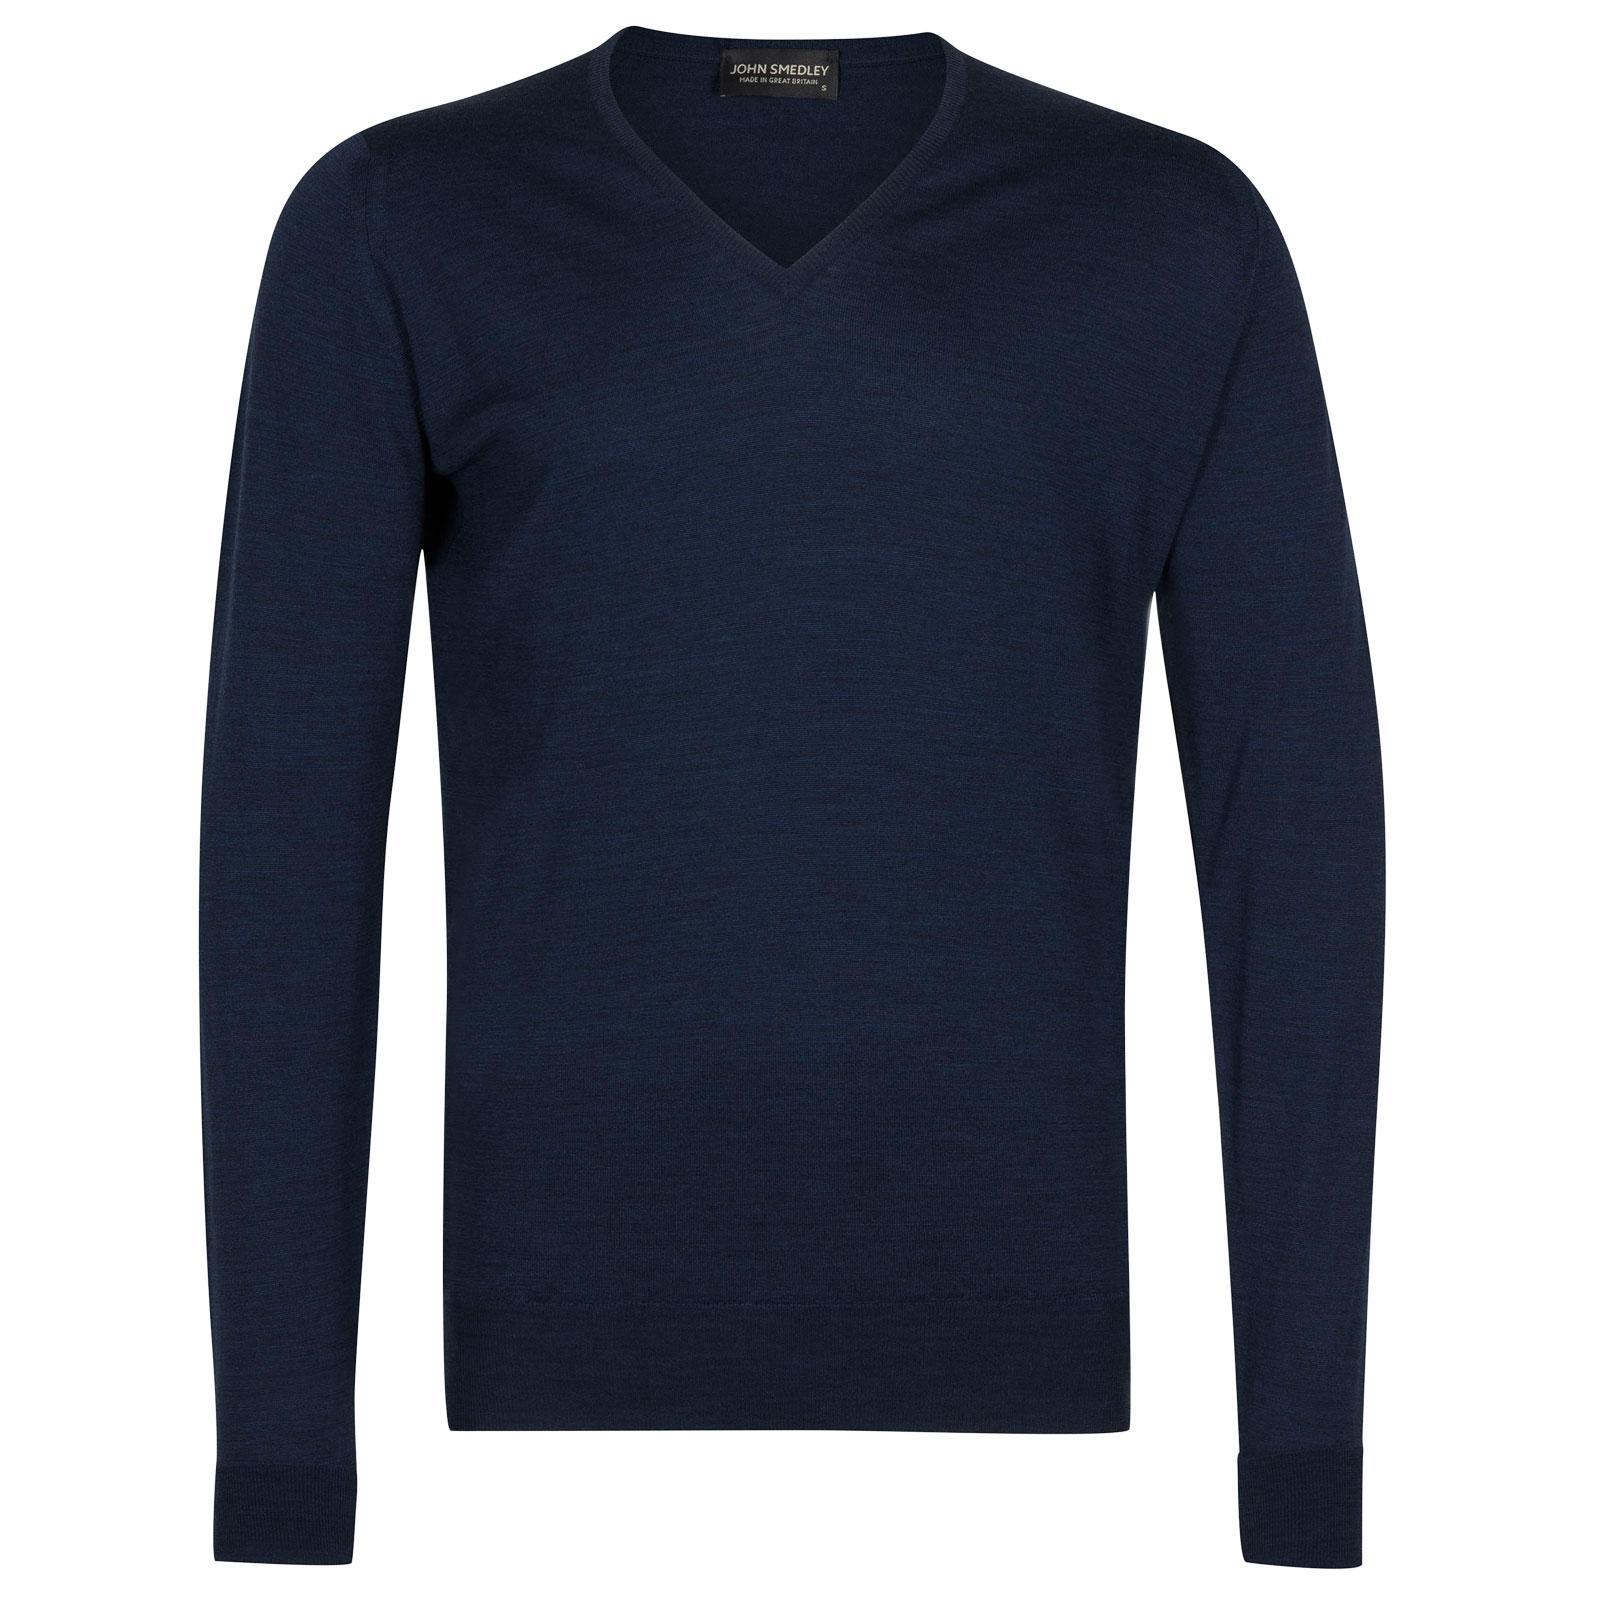 John Smedley Blenheim Merino Wool Pullover in Indigo-S